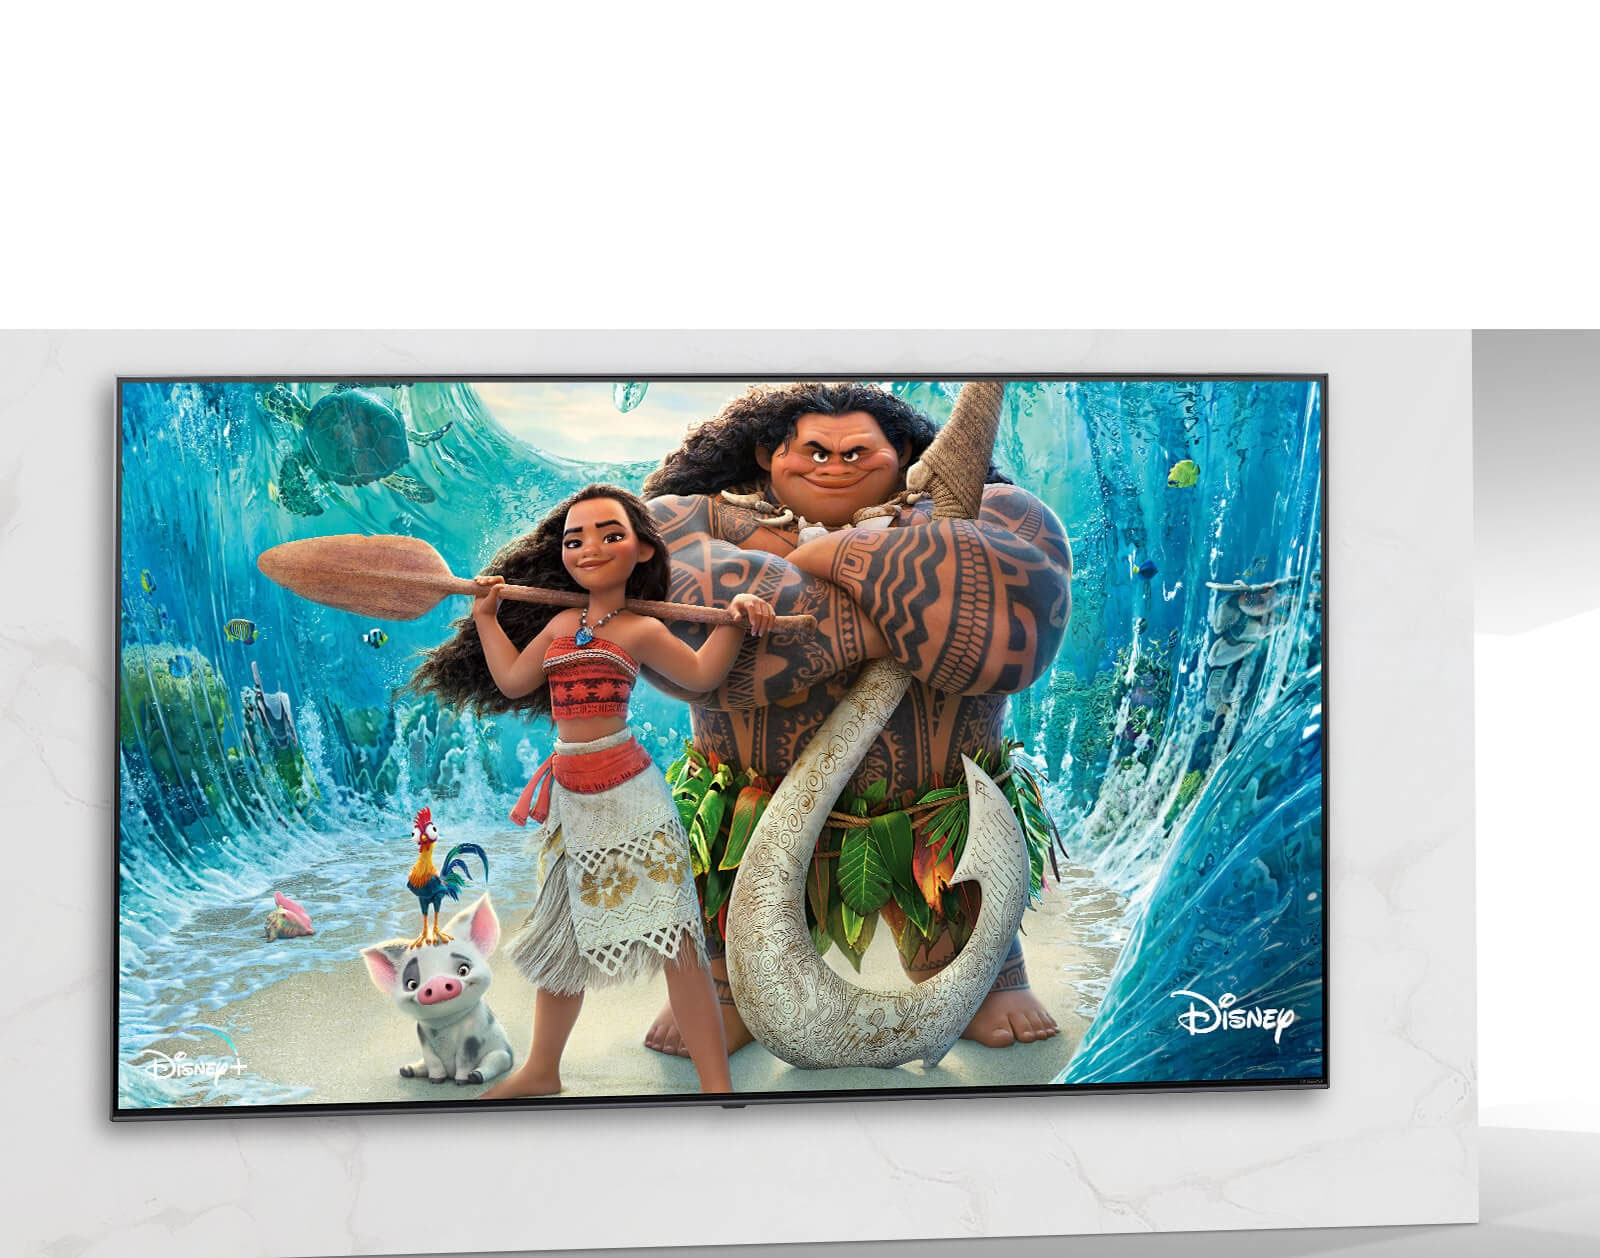 Disney Moana poster image on TV screen